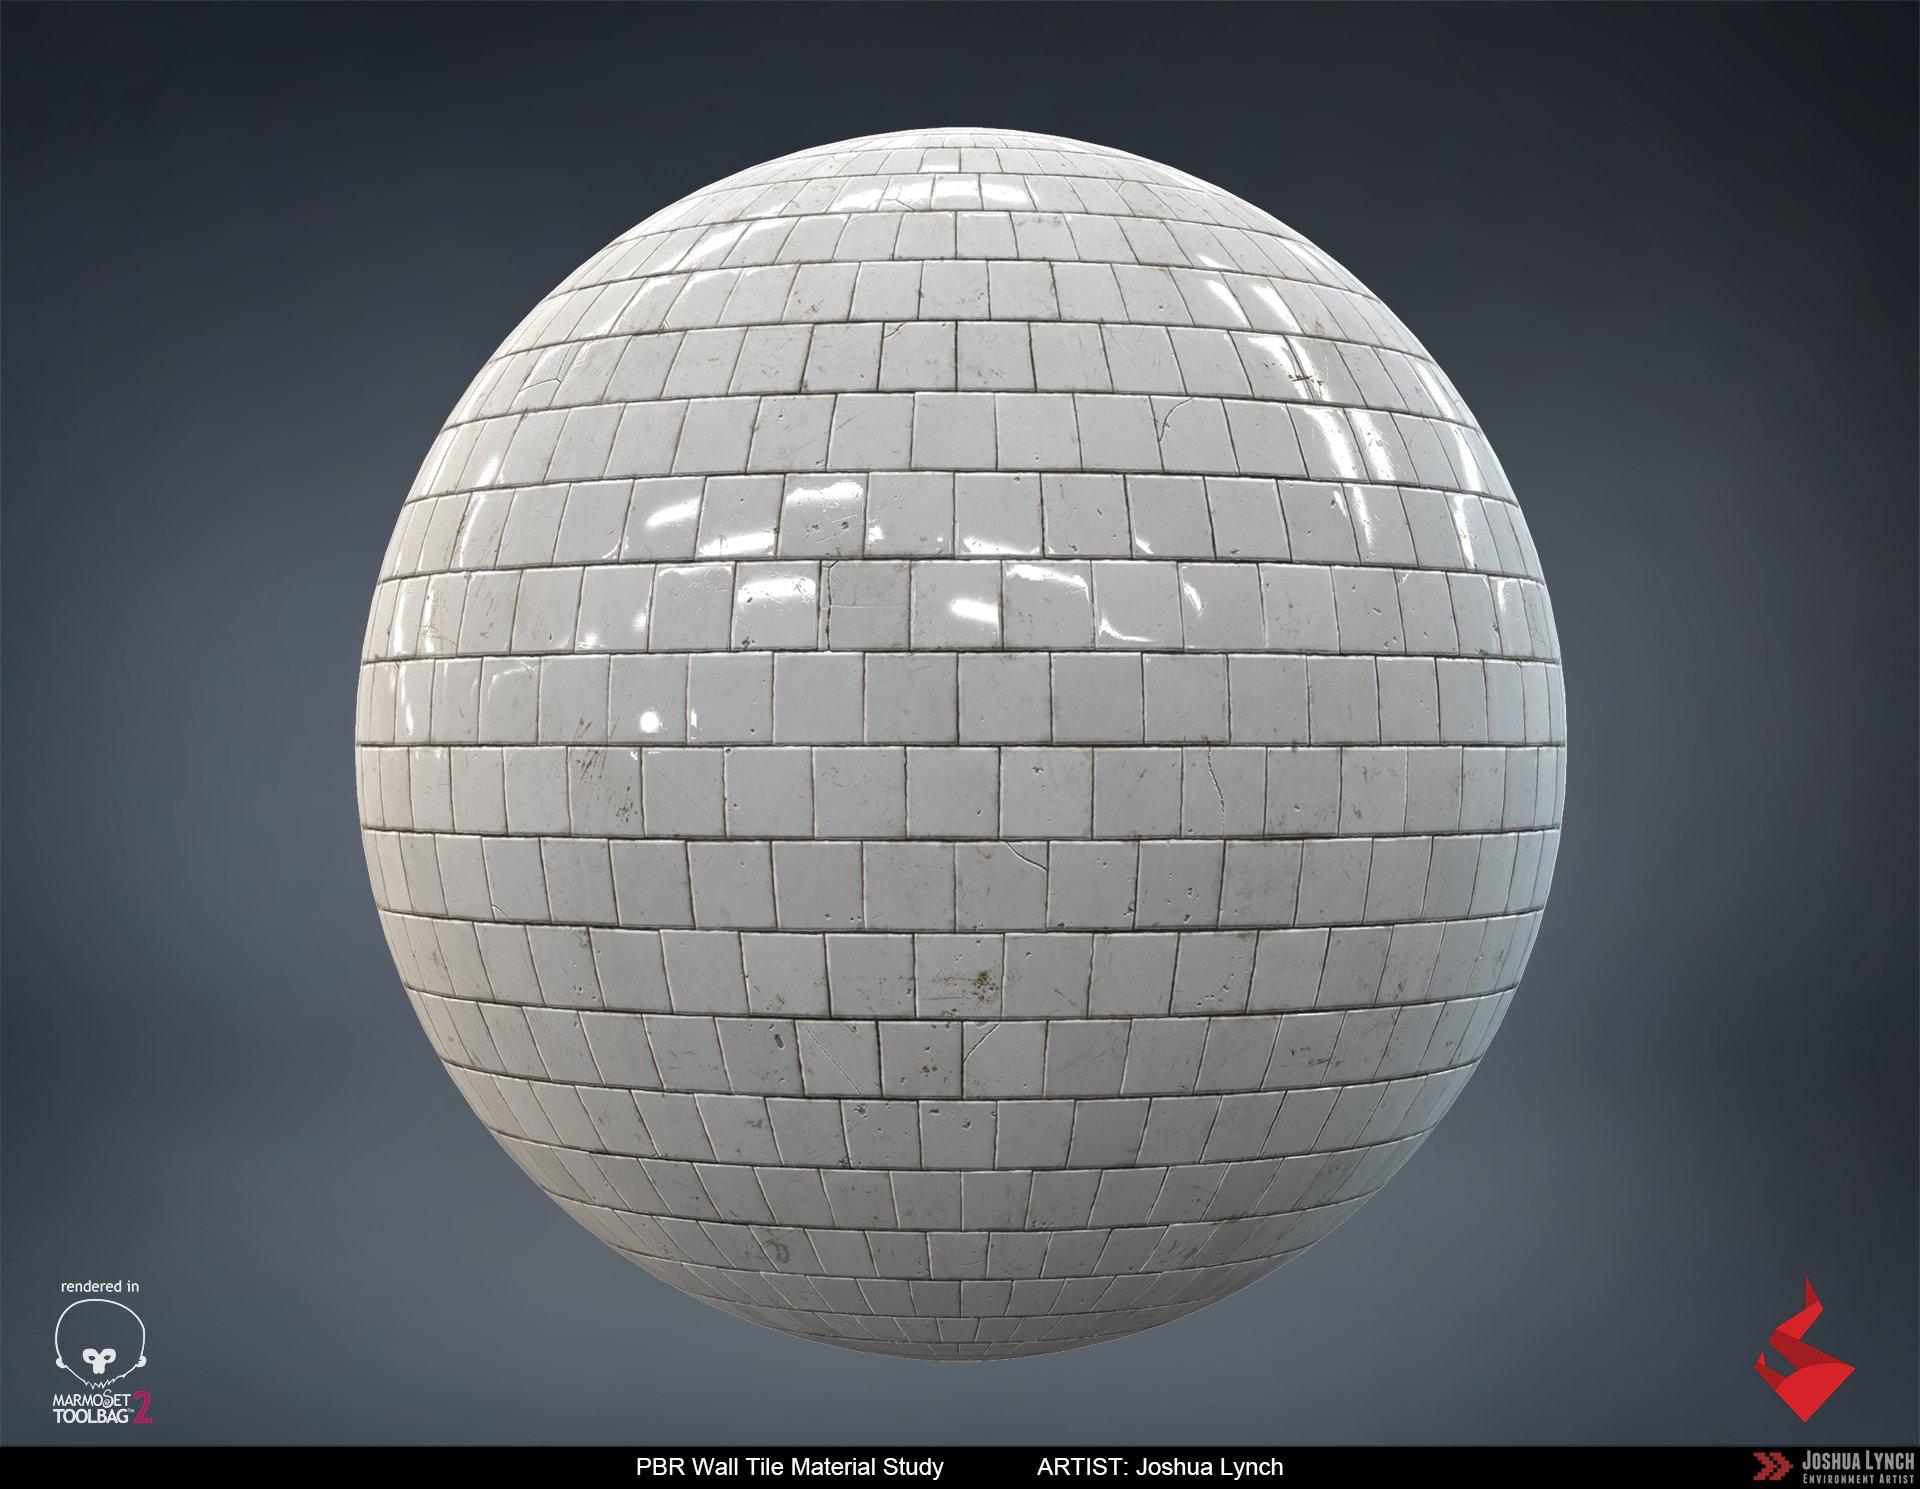 Joshua lynch subway wall tile sphere rev 06 layout comp josh lynch